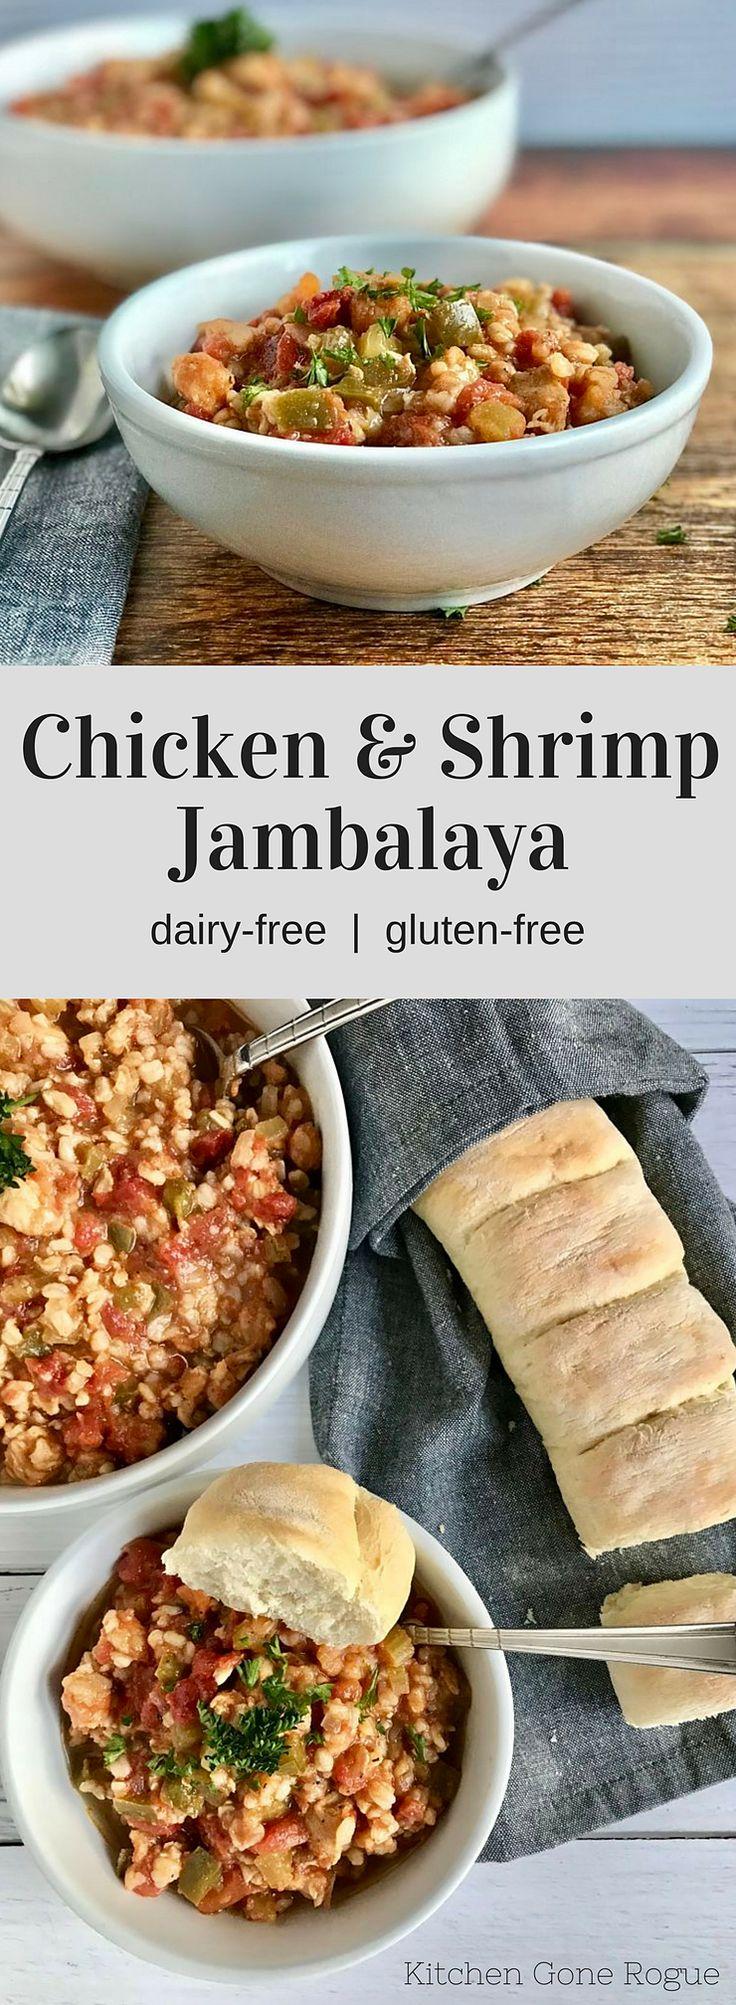 Chicken and Shrimp Jambalaya Kitchen Gone Rogue